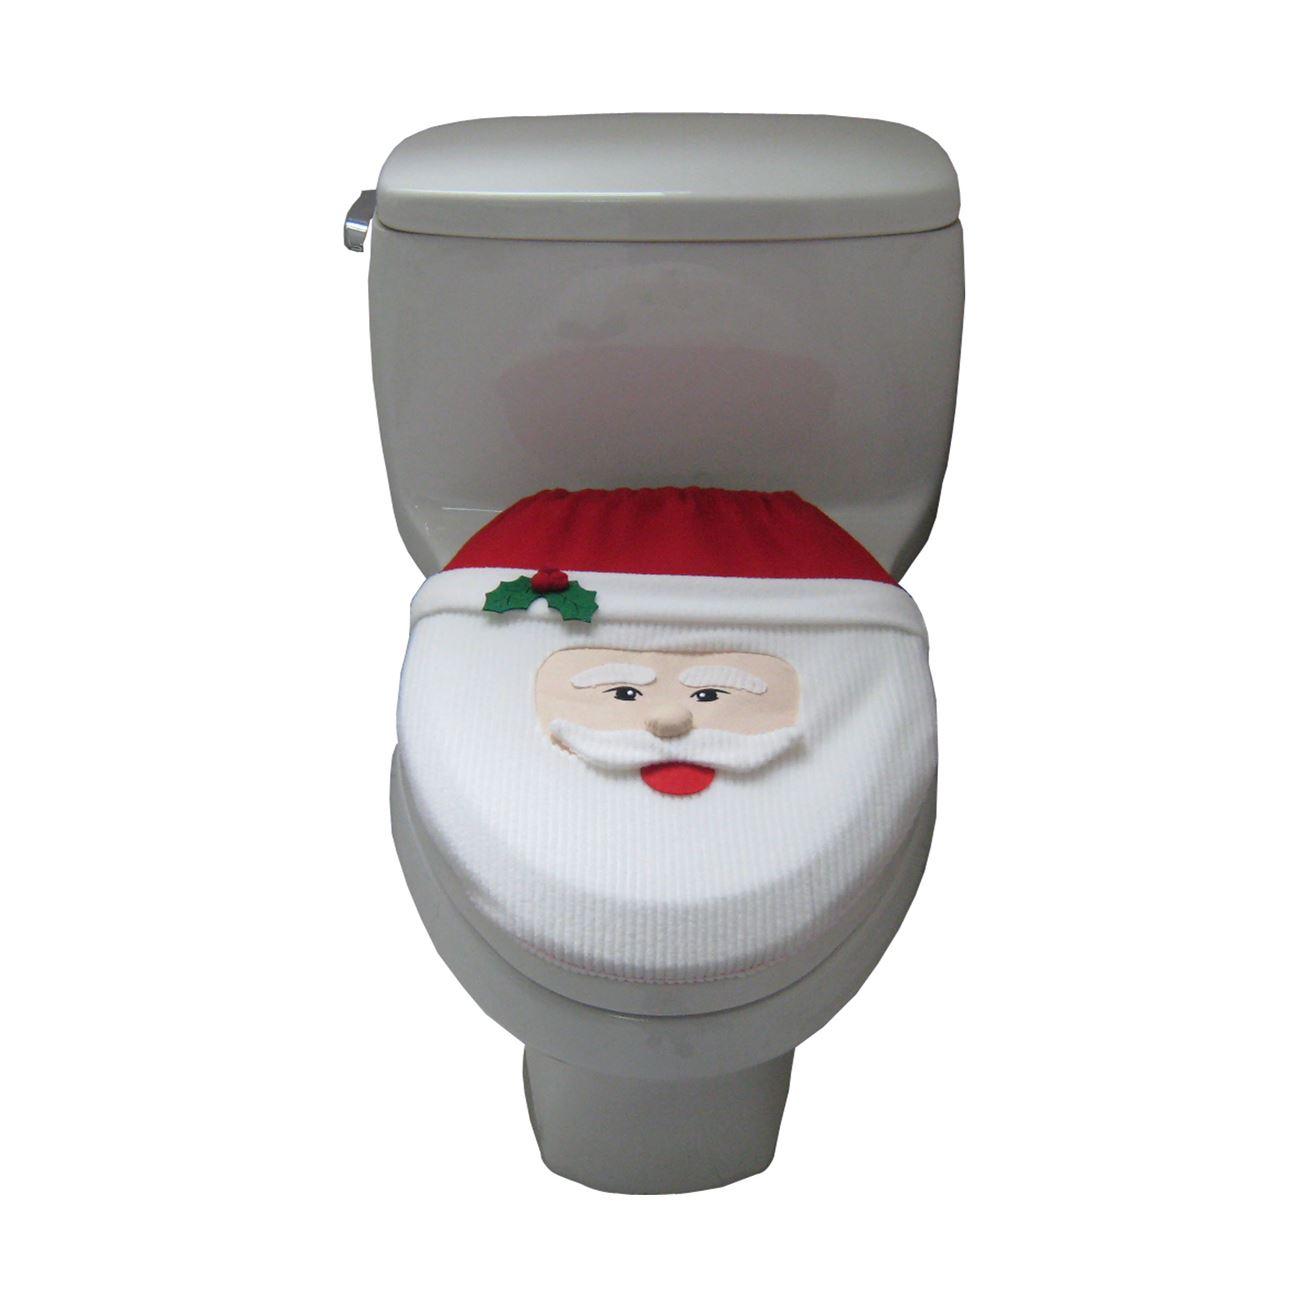 e73067488bf6 Χριστουγεννιάτικο Κάλυμμα Τουαλέτας Άη Βασίλης 42x36   Κάλυμματα Τουαλέτας  Χριστουγεννιάτικα